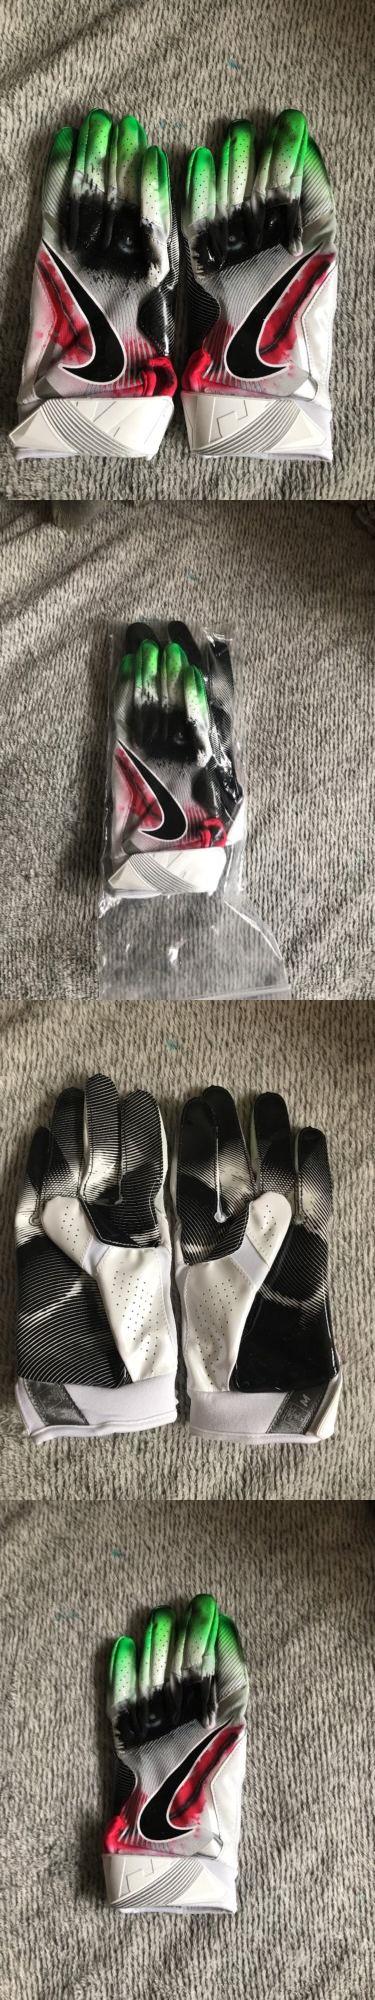 Gloves 159114  Nike Vapor Jet 4.0 Joker Gloves -  BUY IT NOW ONLY   125 on  eBay! 470f4d1a0a